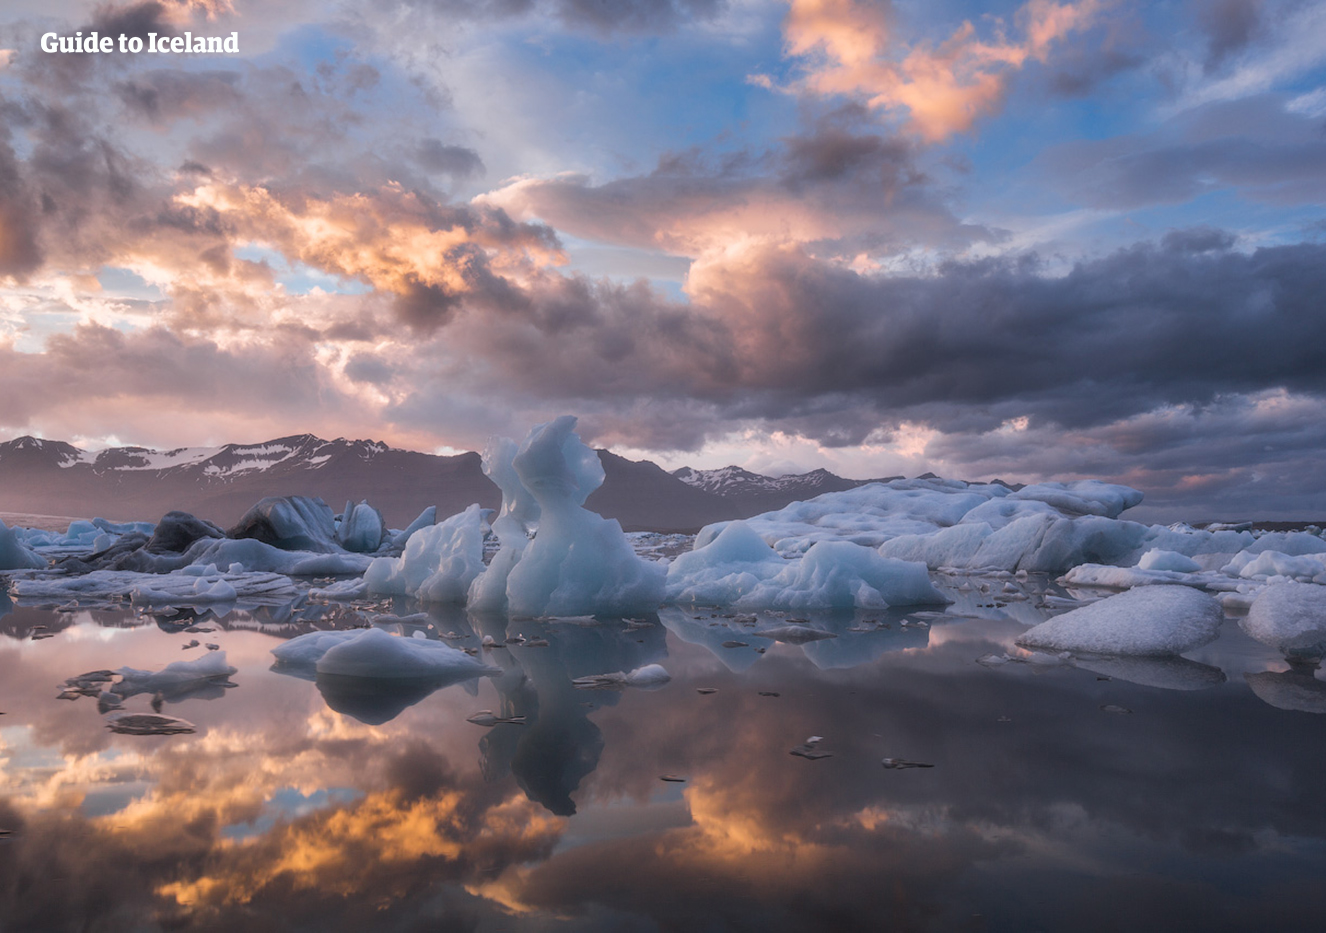 Jokulsarlon glacier lagoon  located in the South of Iceland